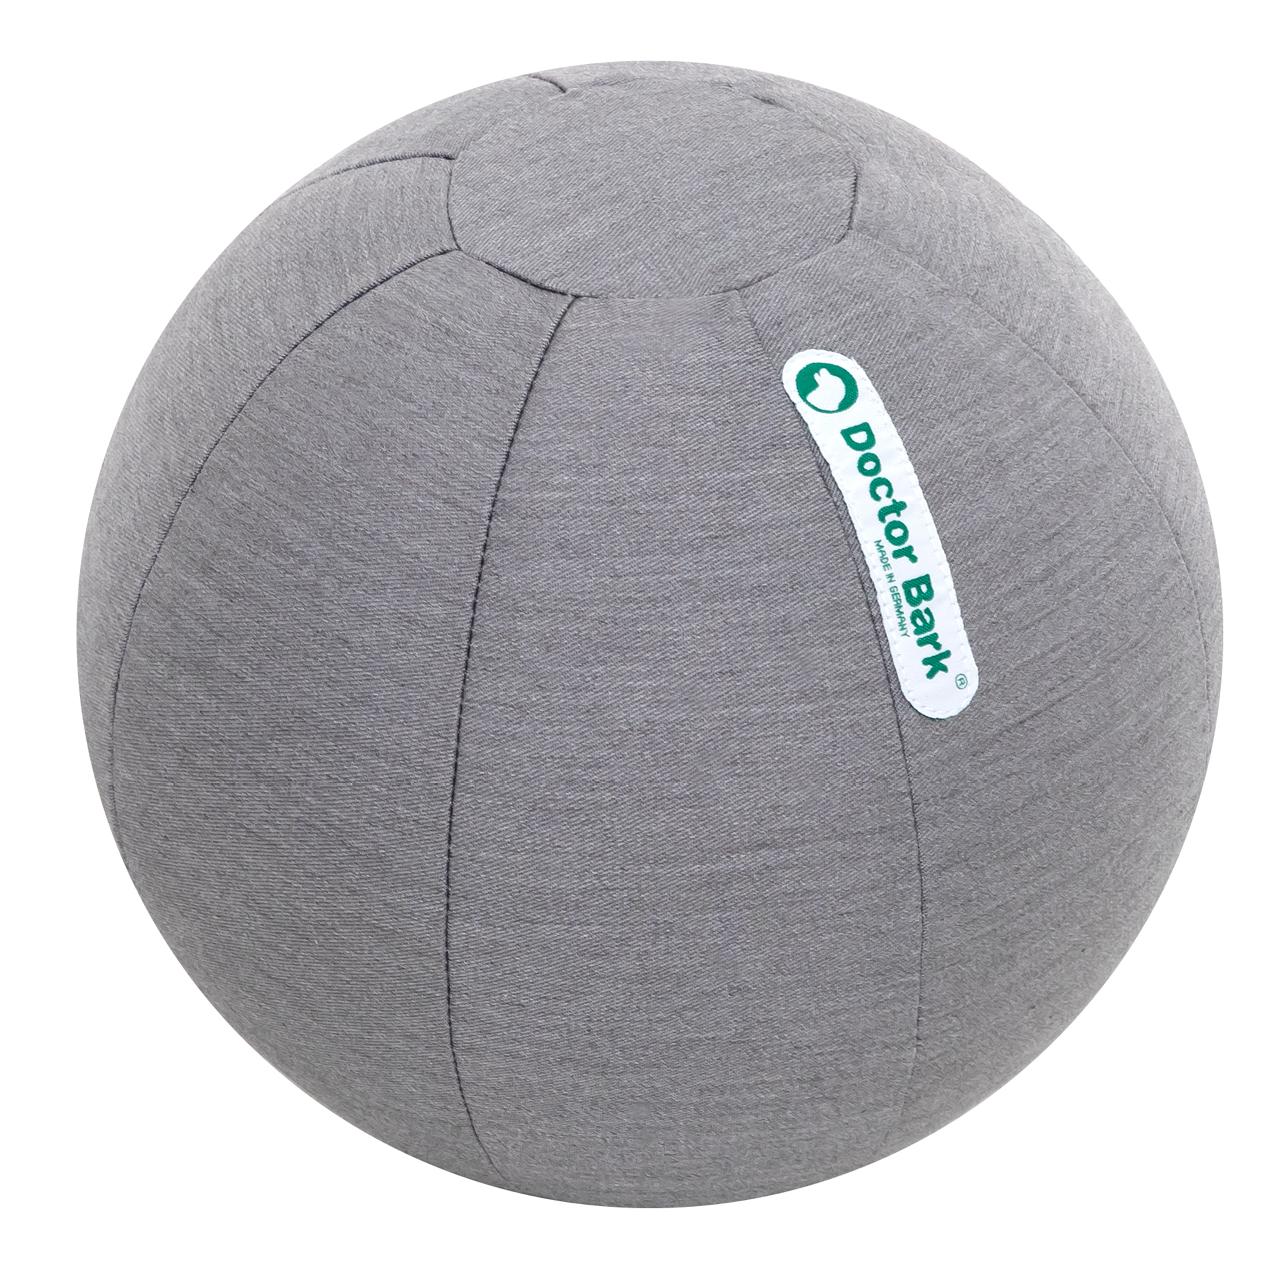 Toy Ball L hellgrau